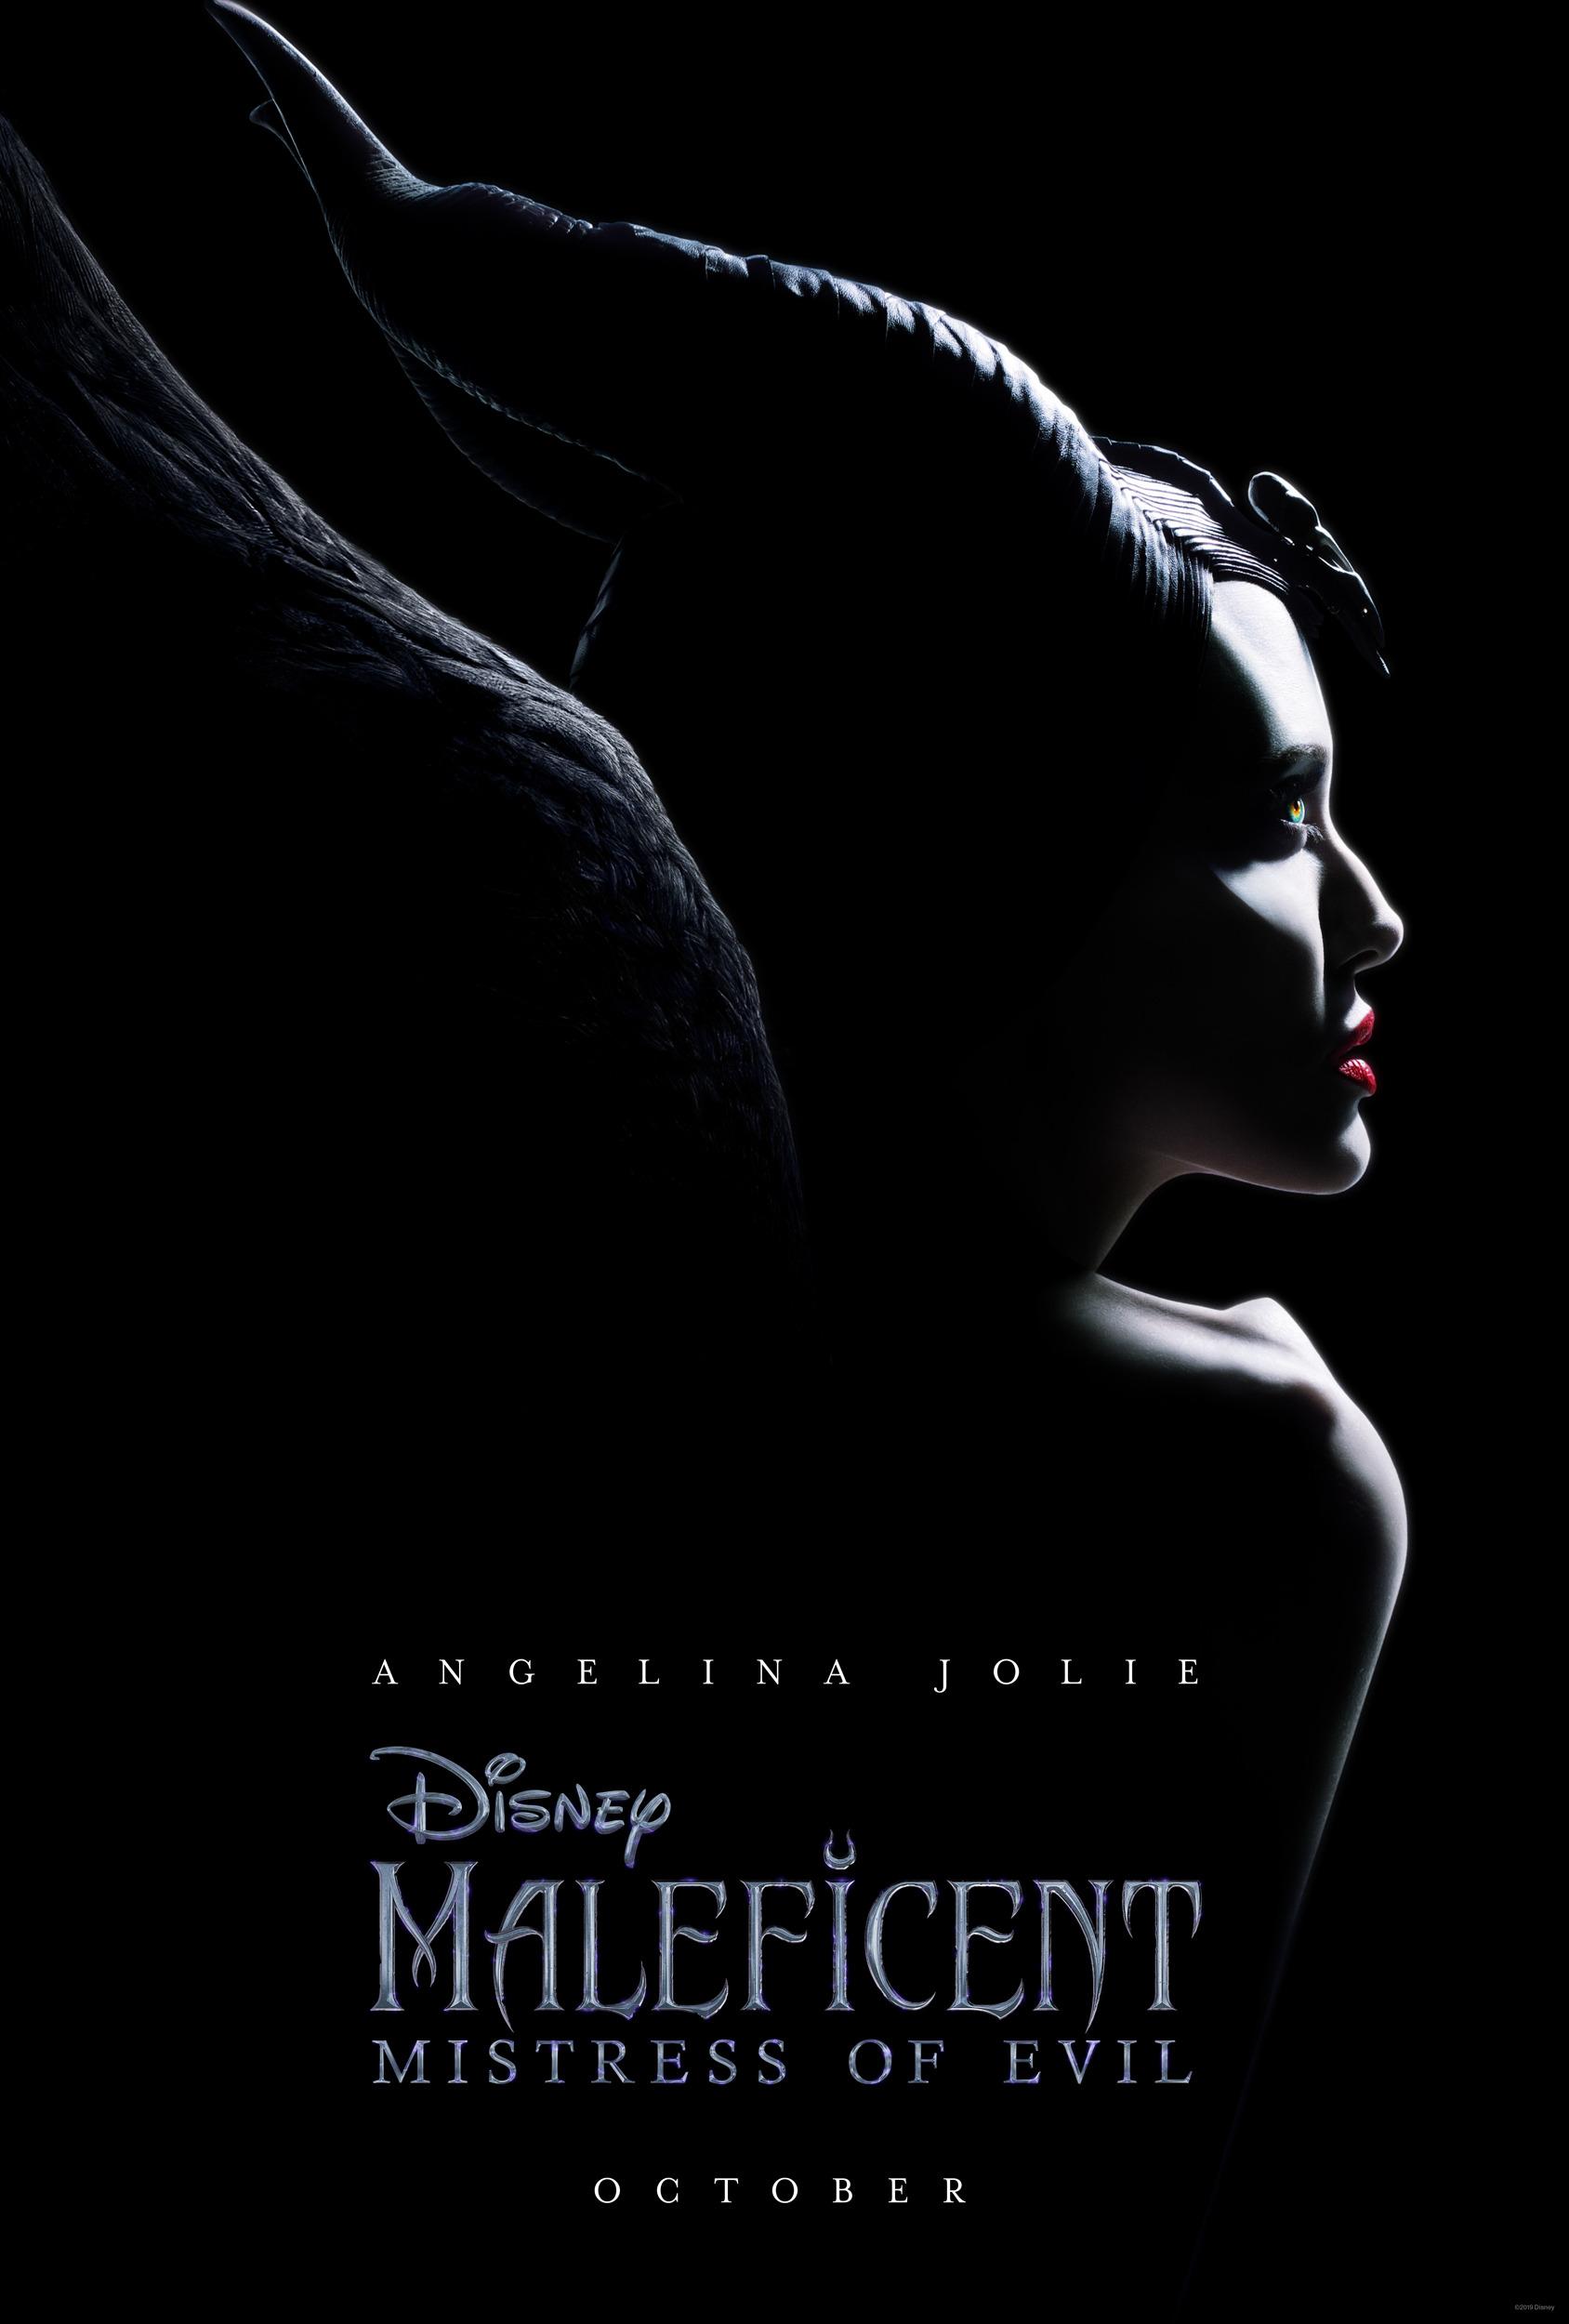 szmk_maleficent_demona_disney_csipkerozsika_a_sotetseg_urnoje_mistress_of_evil_3.jpg